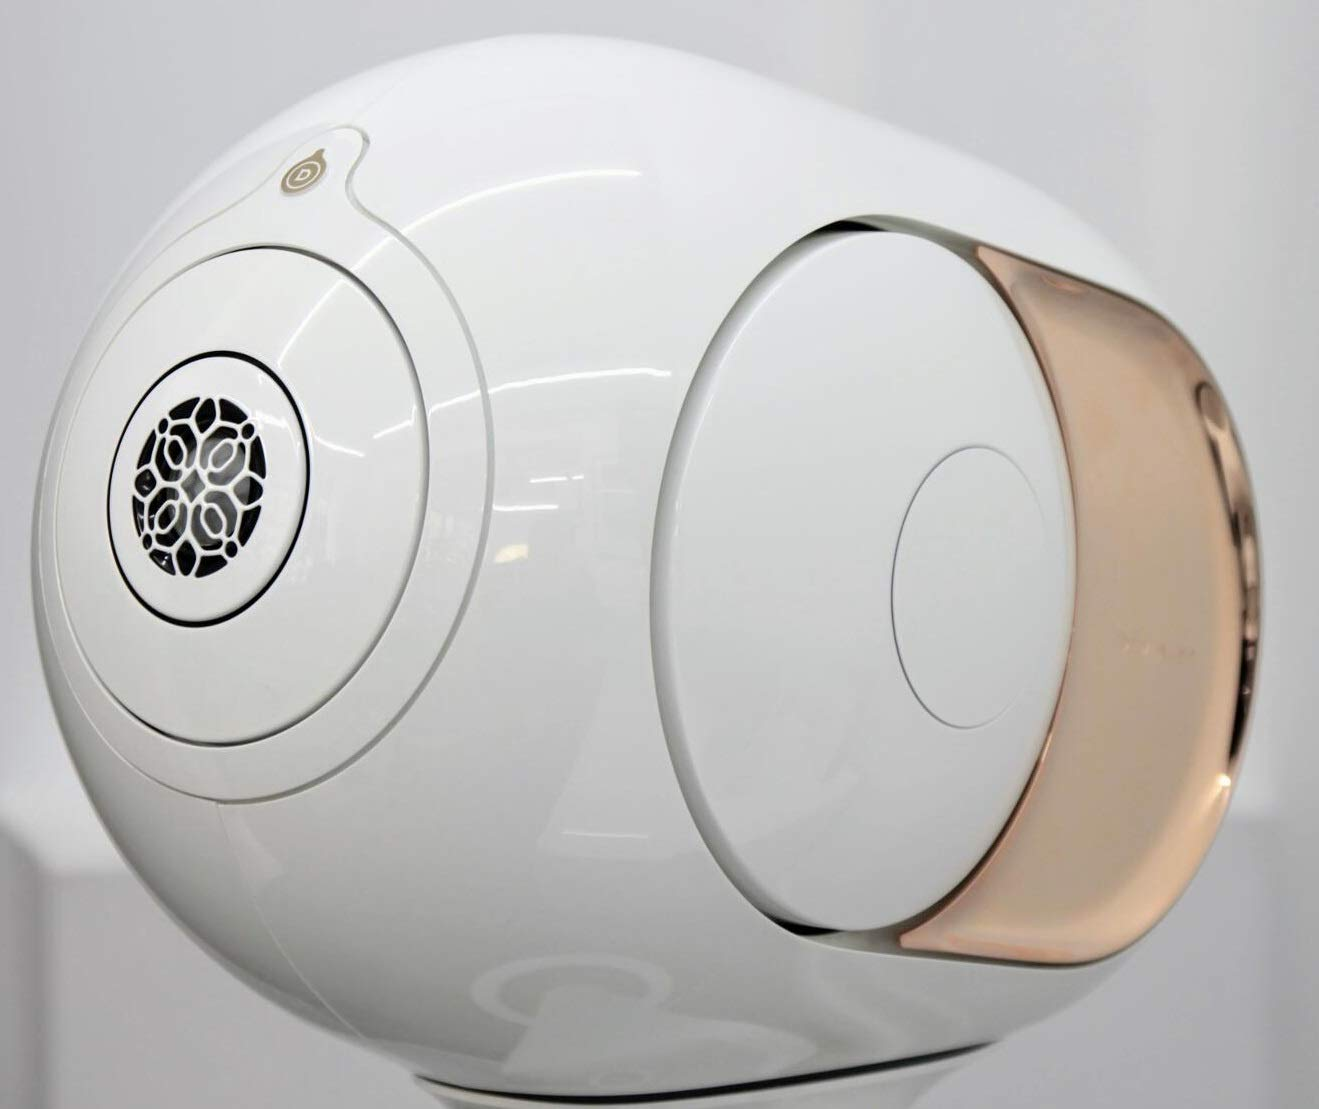 Devialet Phantom - ハイエンドワイヤレススピーカー (認定リファービッシュ品) (4500 Watts) Gold-cr B07JBKCR9G Gold (4500 W)